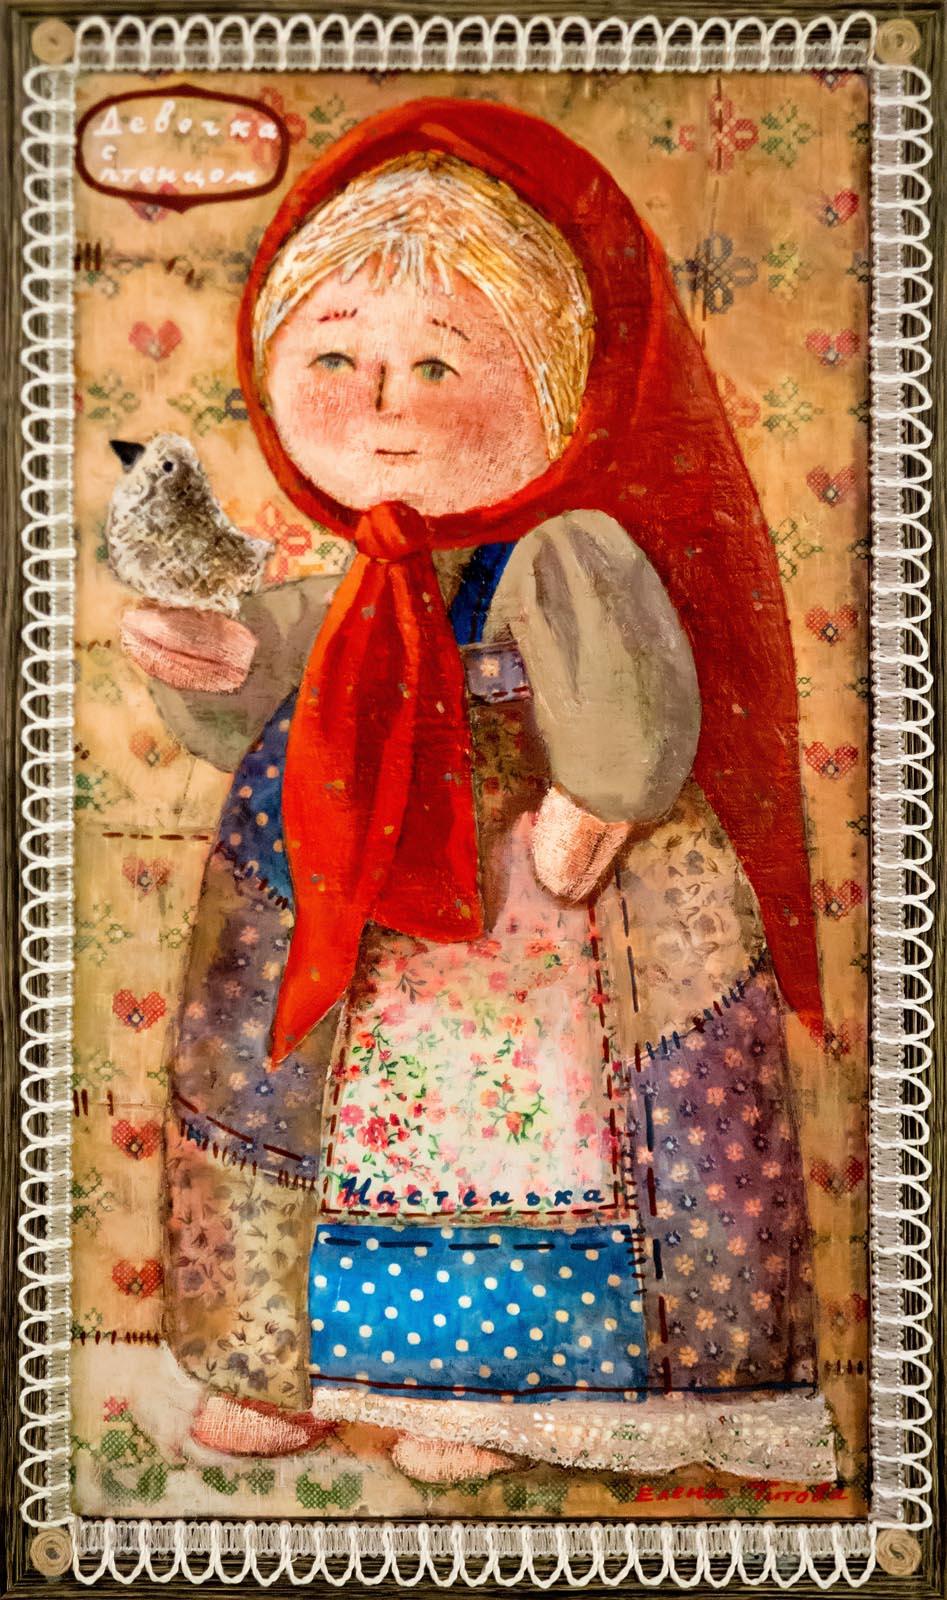 Фото №272761. Девочка - птенцом. Настенька. Автор: Елена Титова